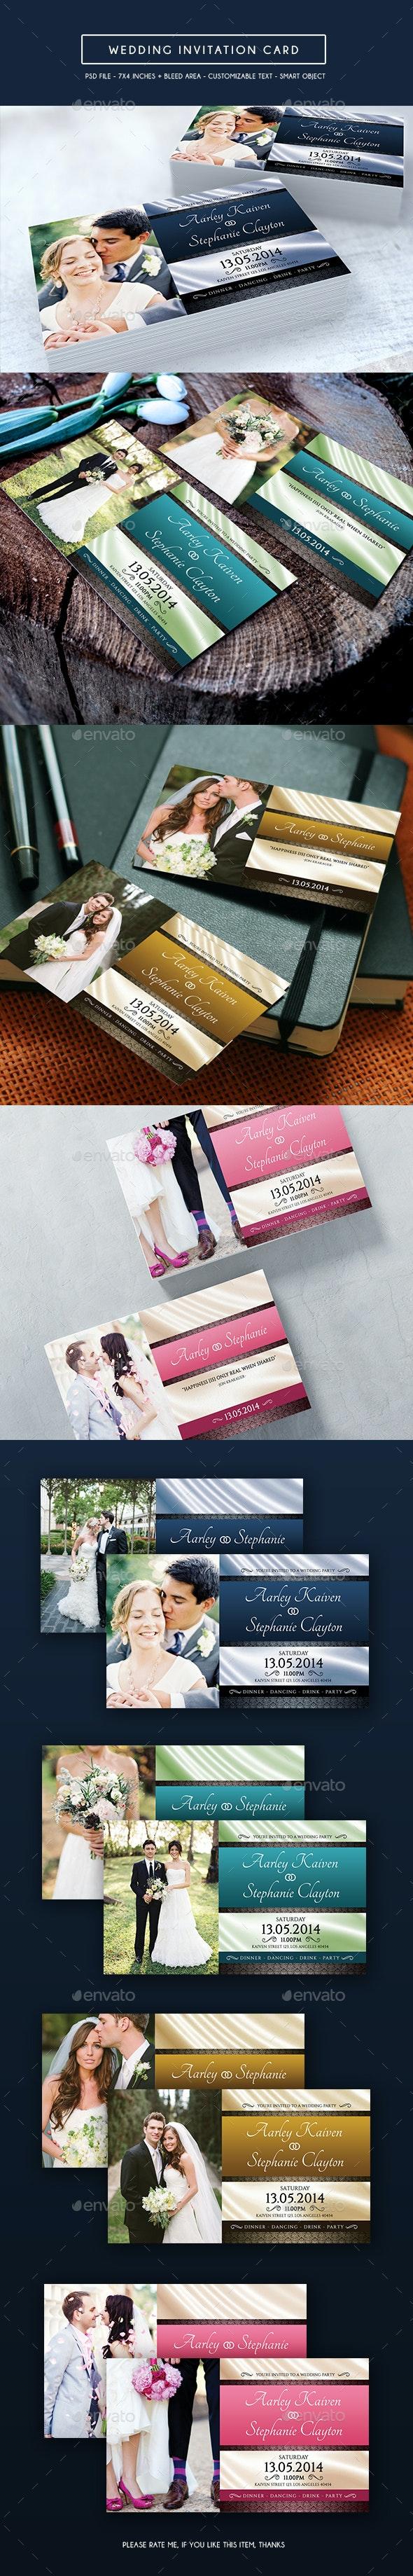 Wedding Invitation Card - Weddings Cards & Invites